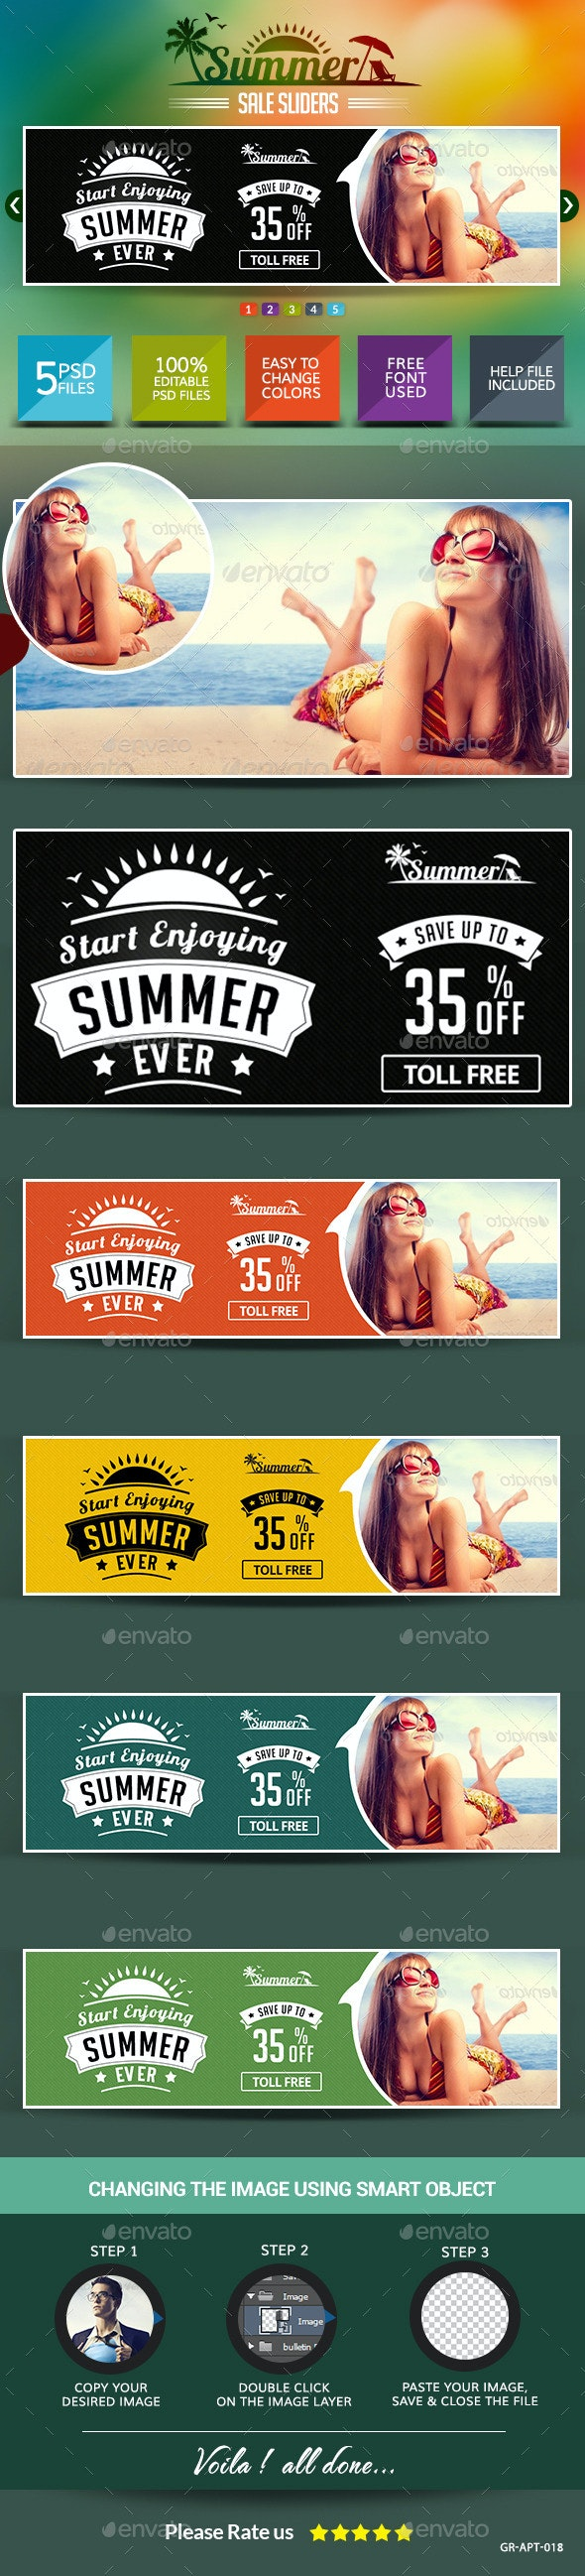 Summer Sale Sliders - Sliders & Features Web Elements